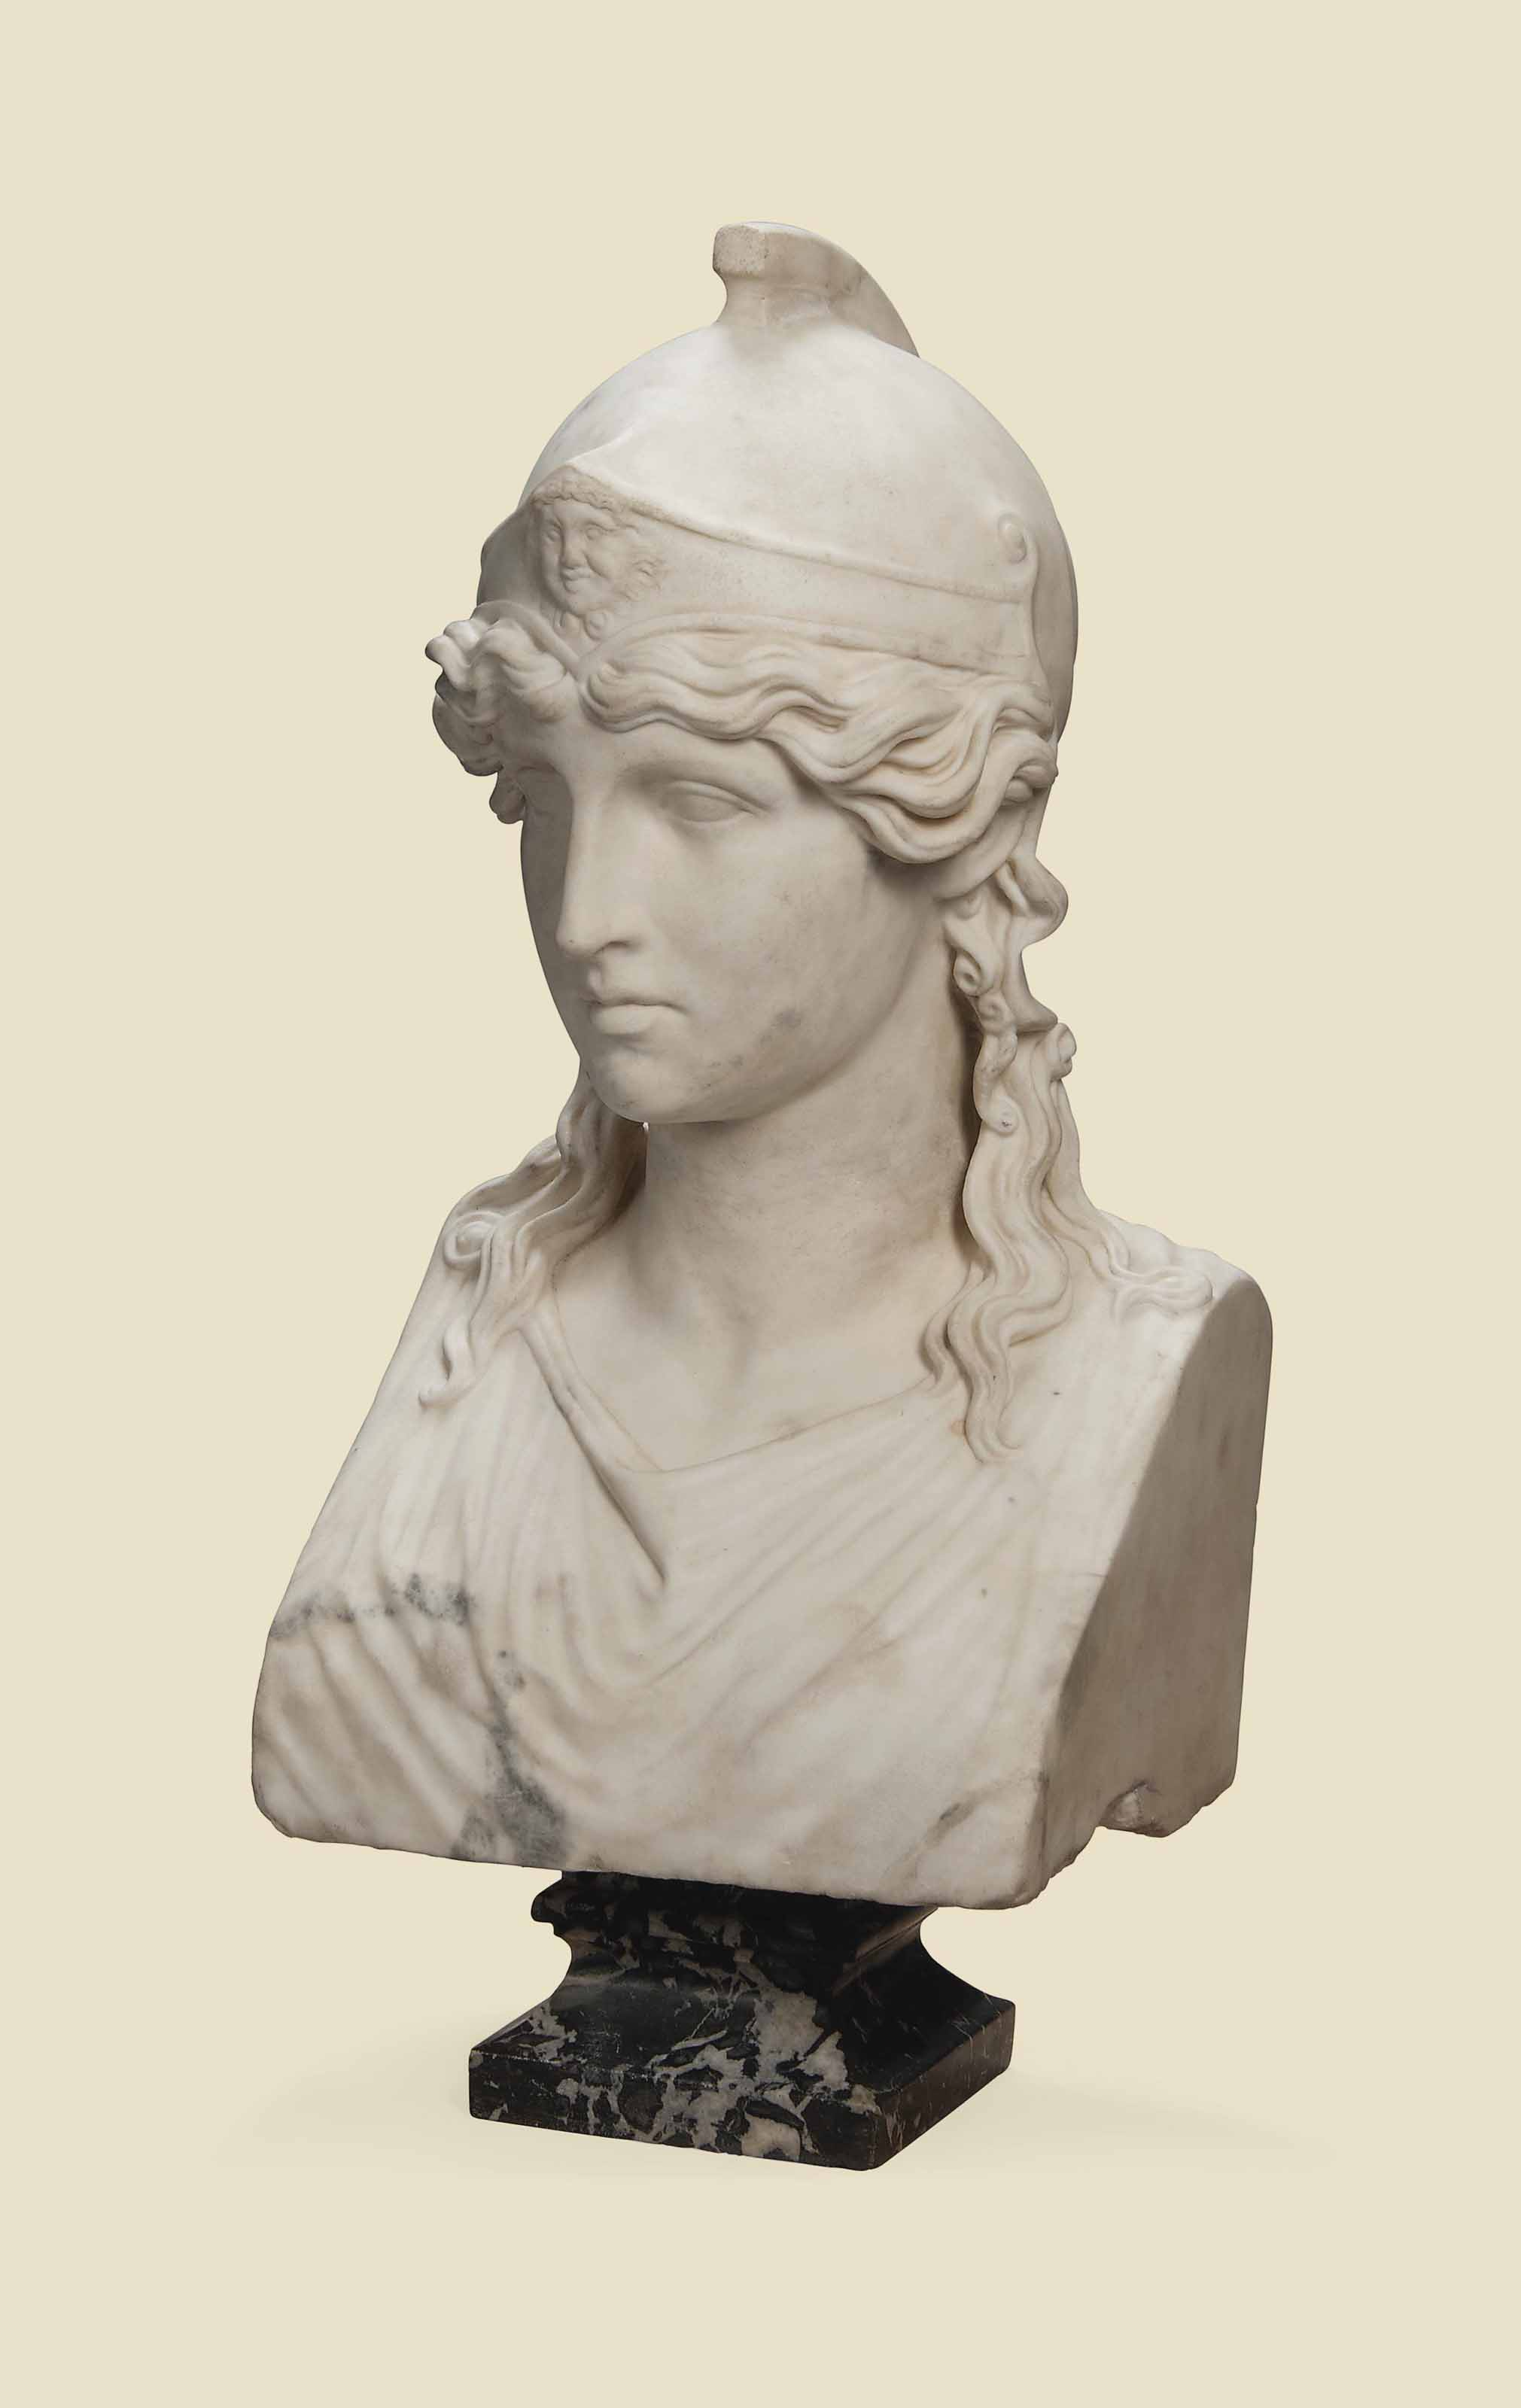 Bust of athena - Homework Example